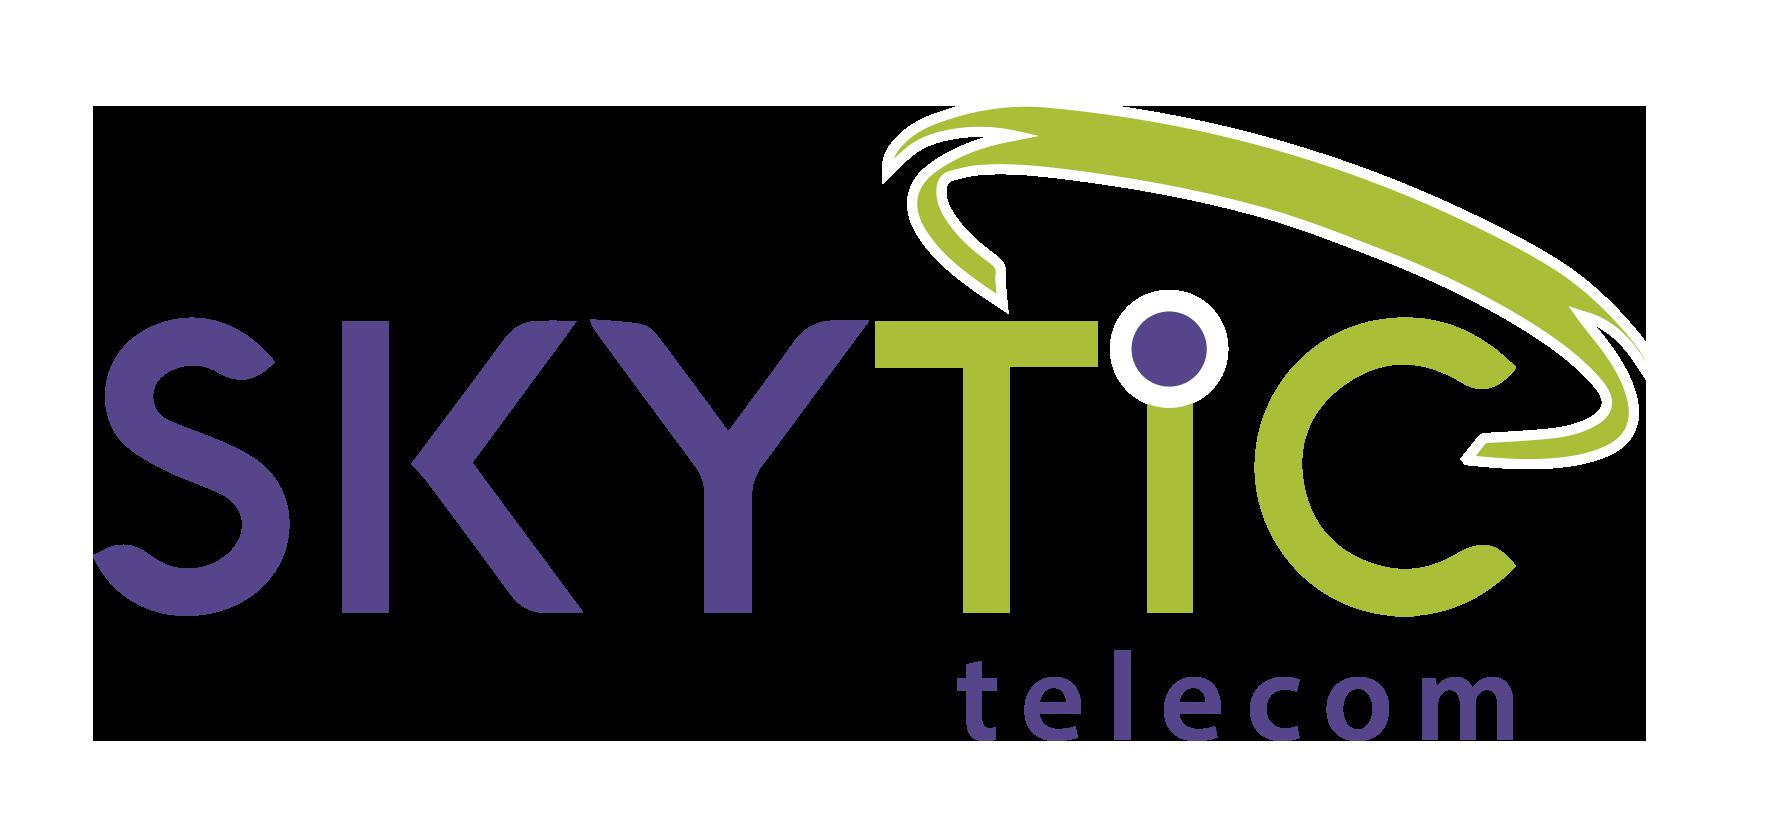 Skytic Telecom